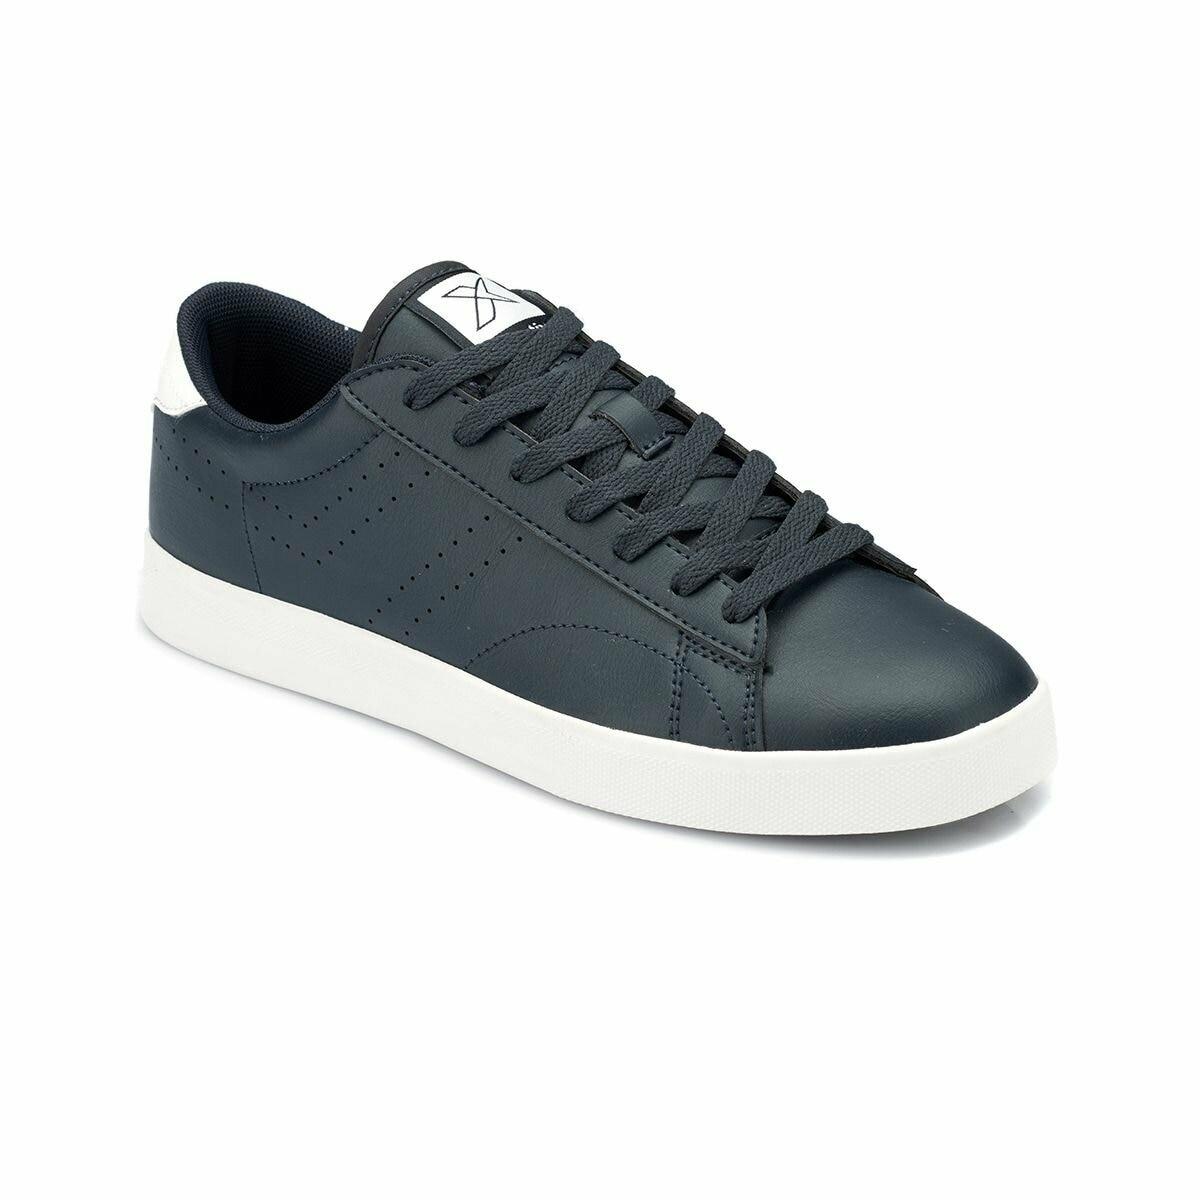 FLO SUPREM M Navy Blue Men 'S Sneaker Shoes KINETIX